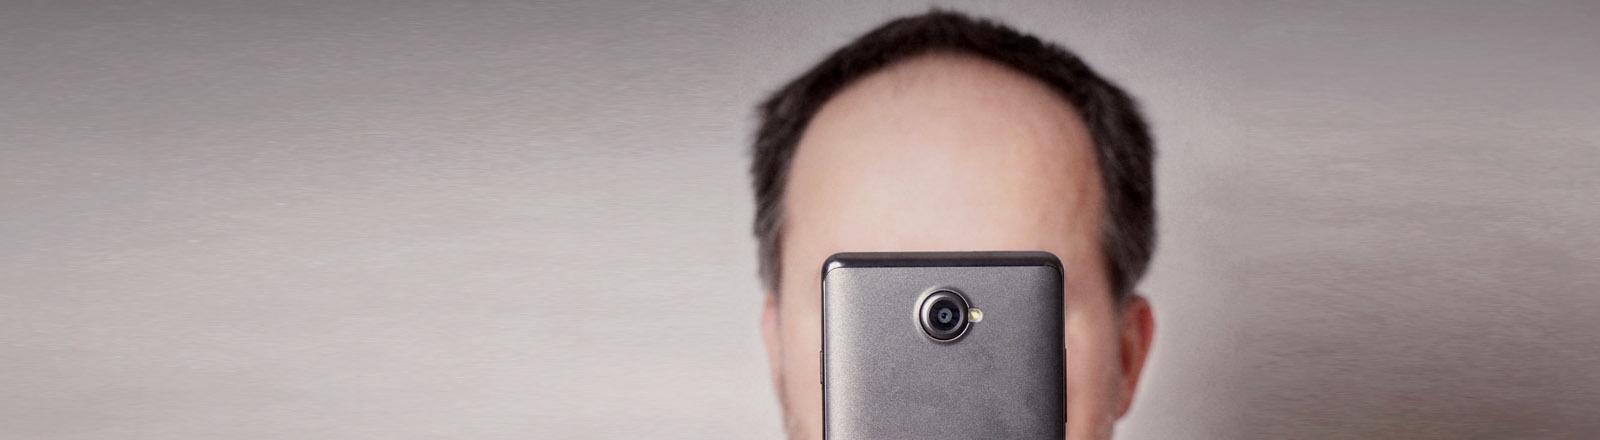 Mann hält Smartphone vors Gesicht